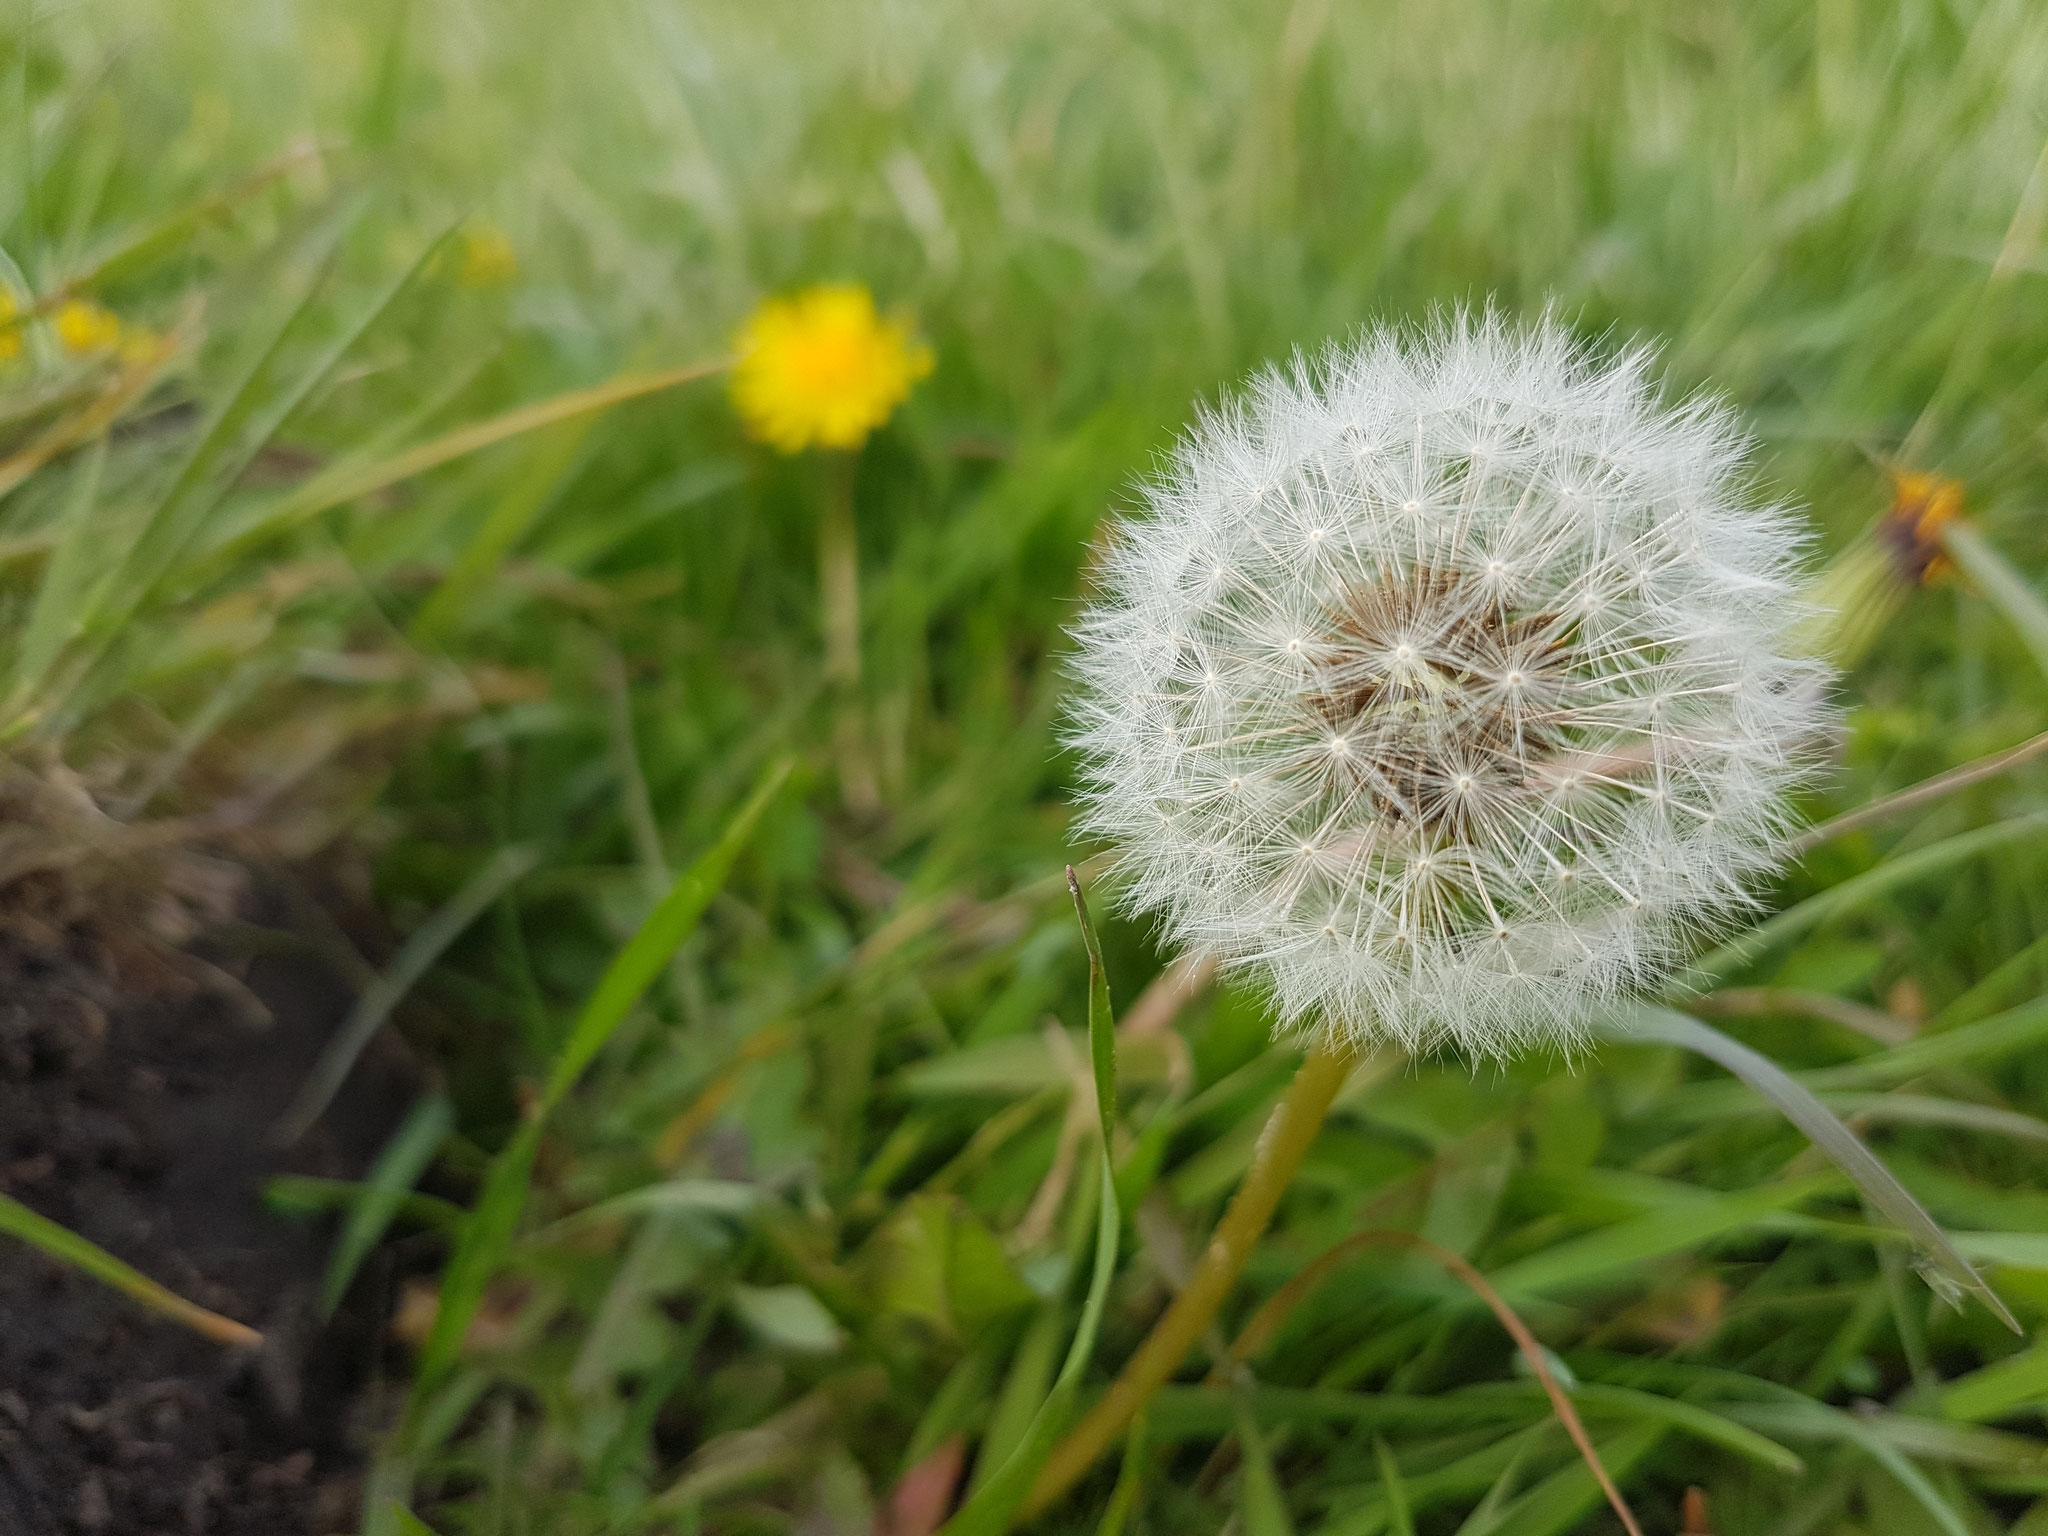 Dandelion / Pusteblume